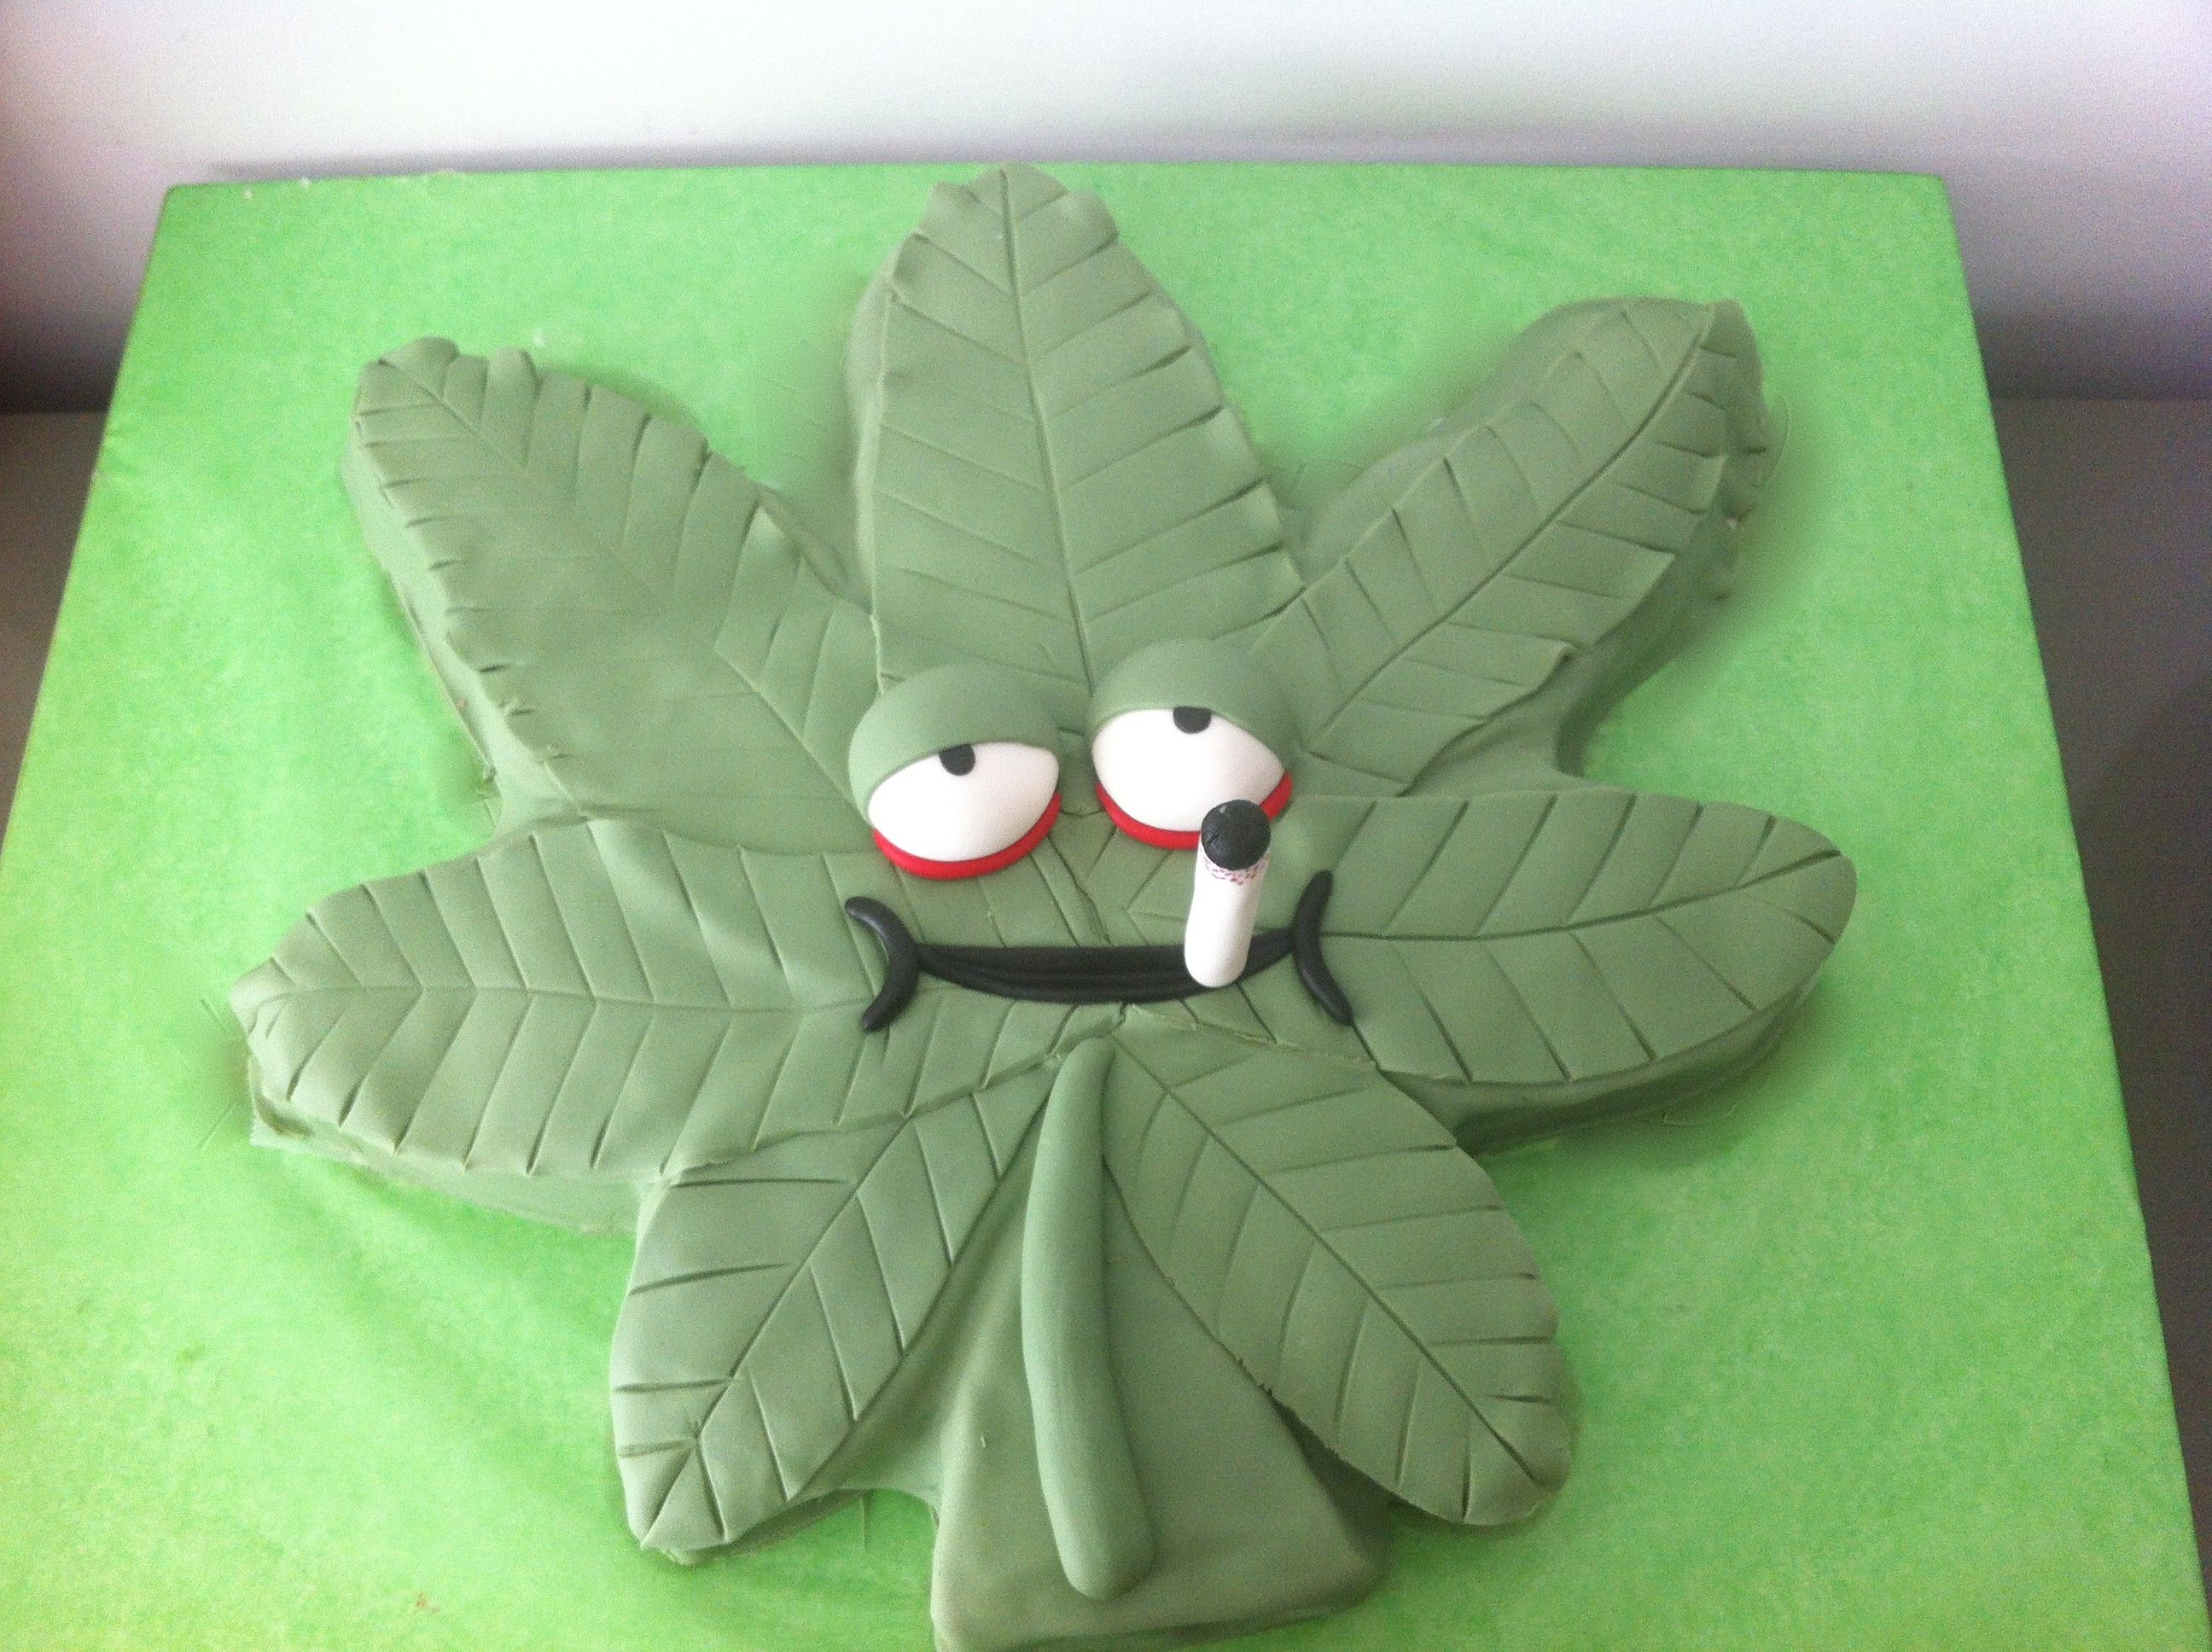 Tarta decorada como una hoja de marihuana Marihuana Cake